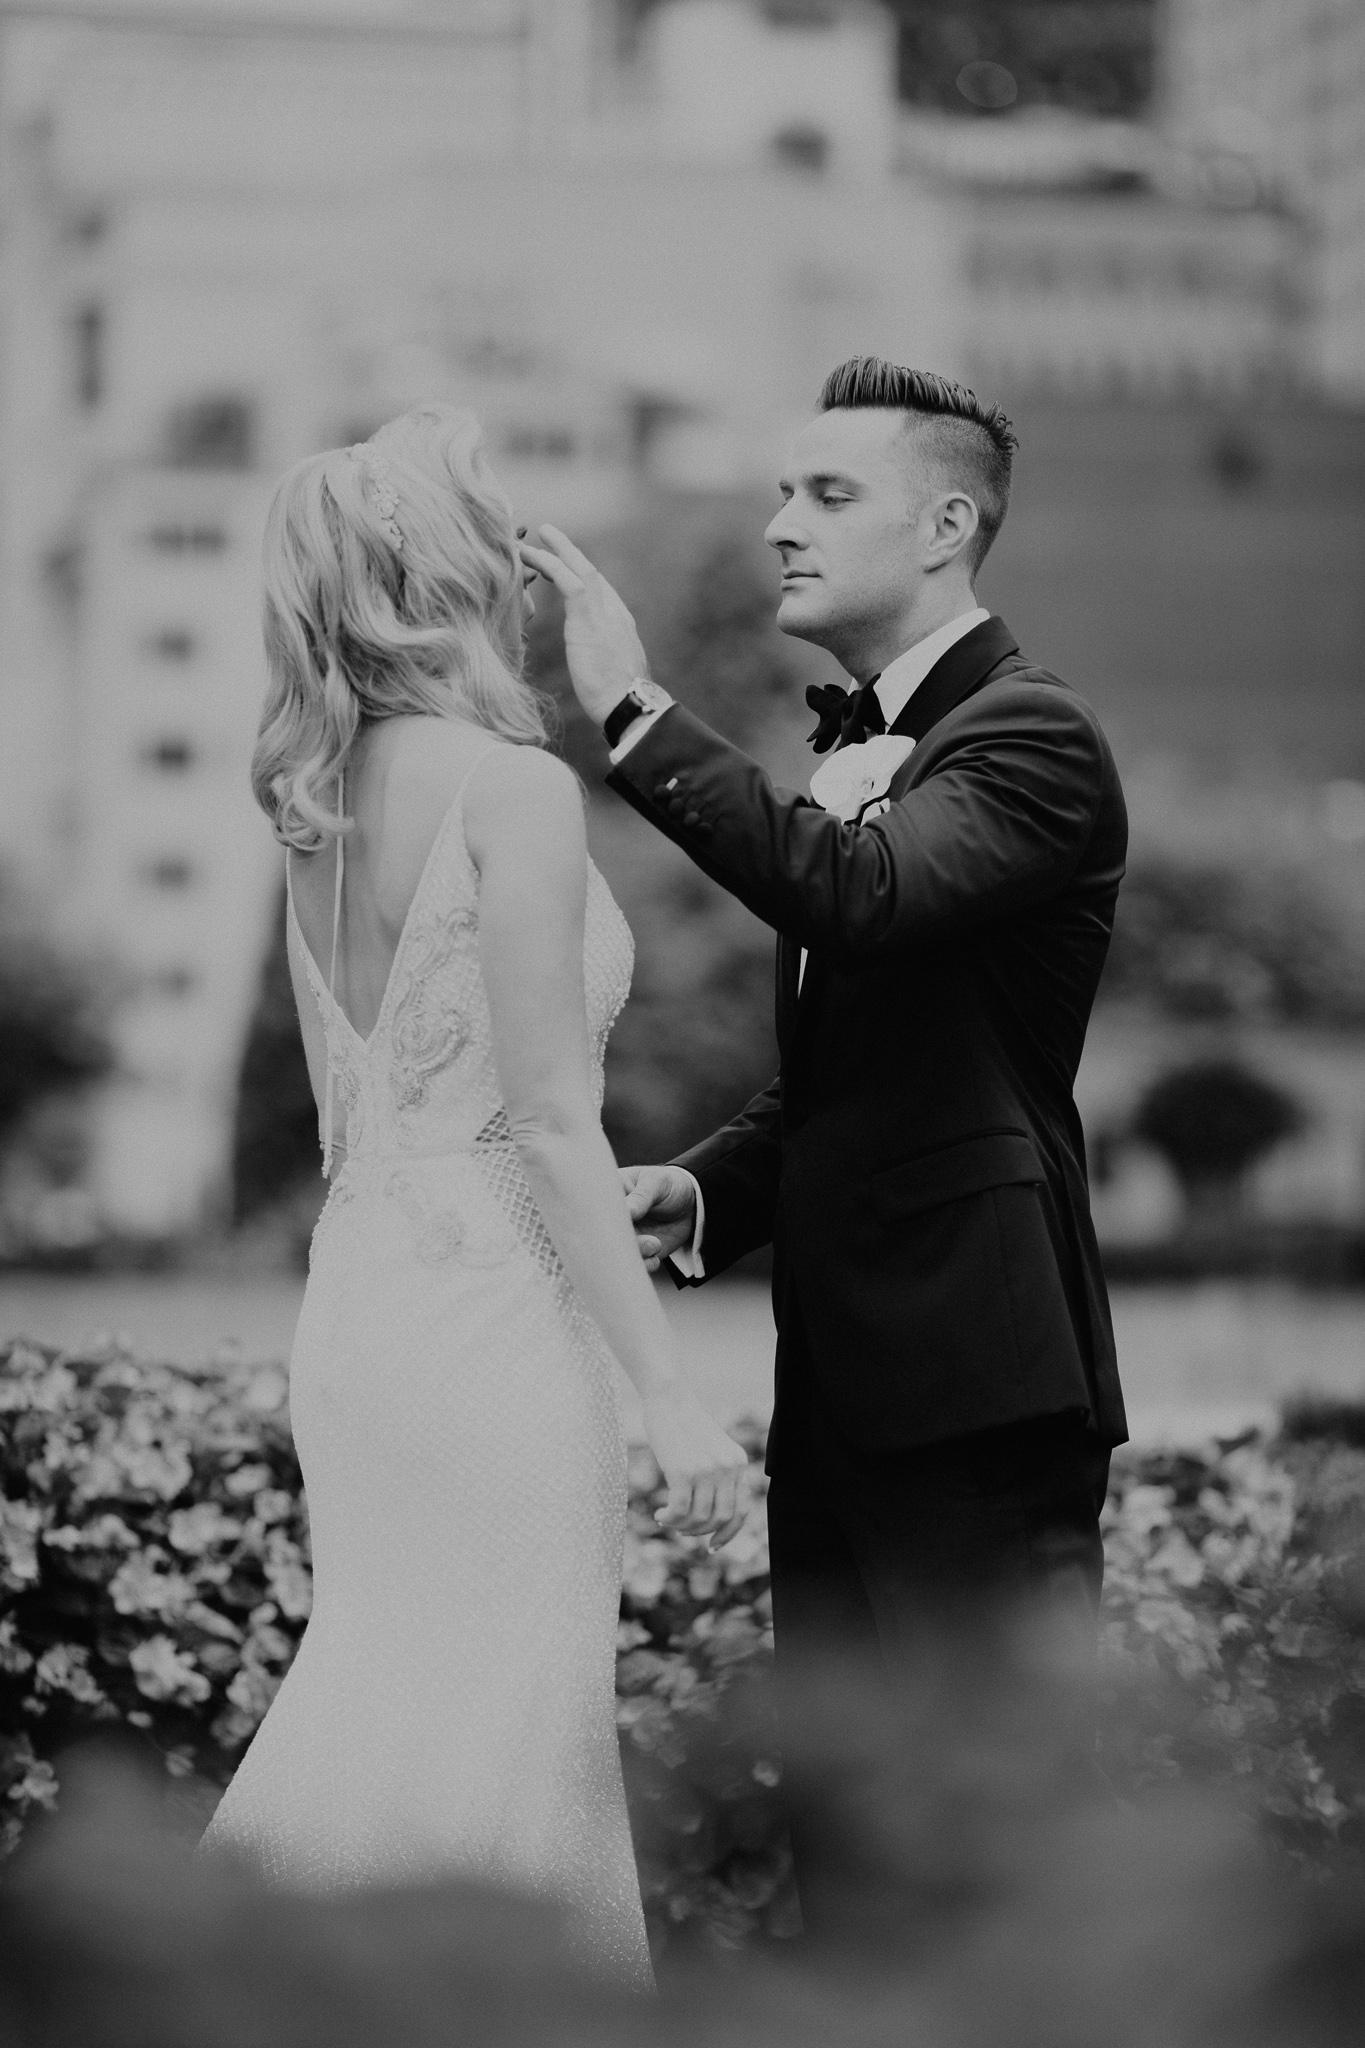 M+J_NYC_Wedding_StPatricks_30Rock_RainbowRoom_036.jpg